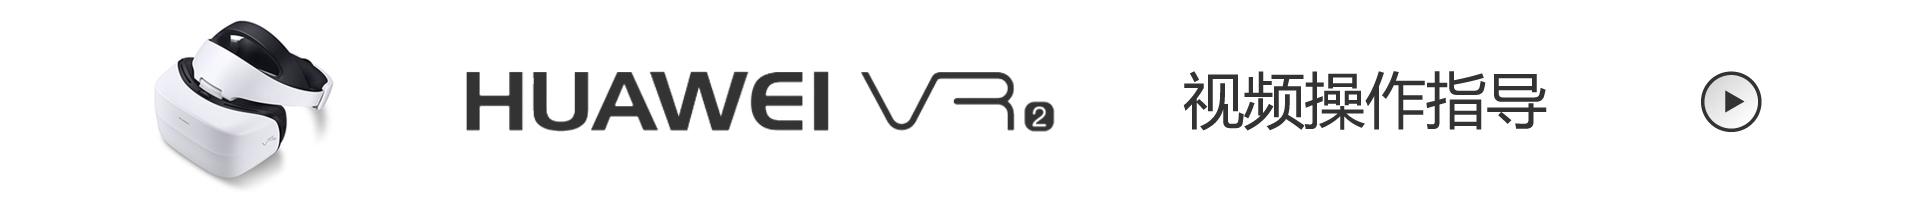 Vmall-HUAWEI VR2 1920.jpg